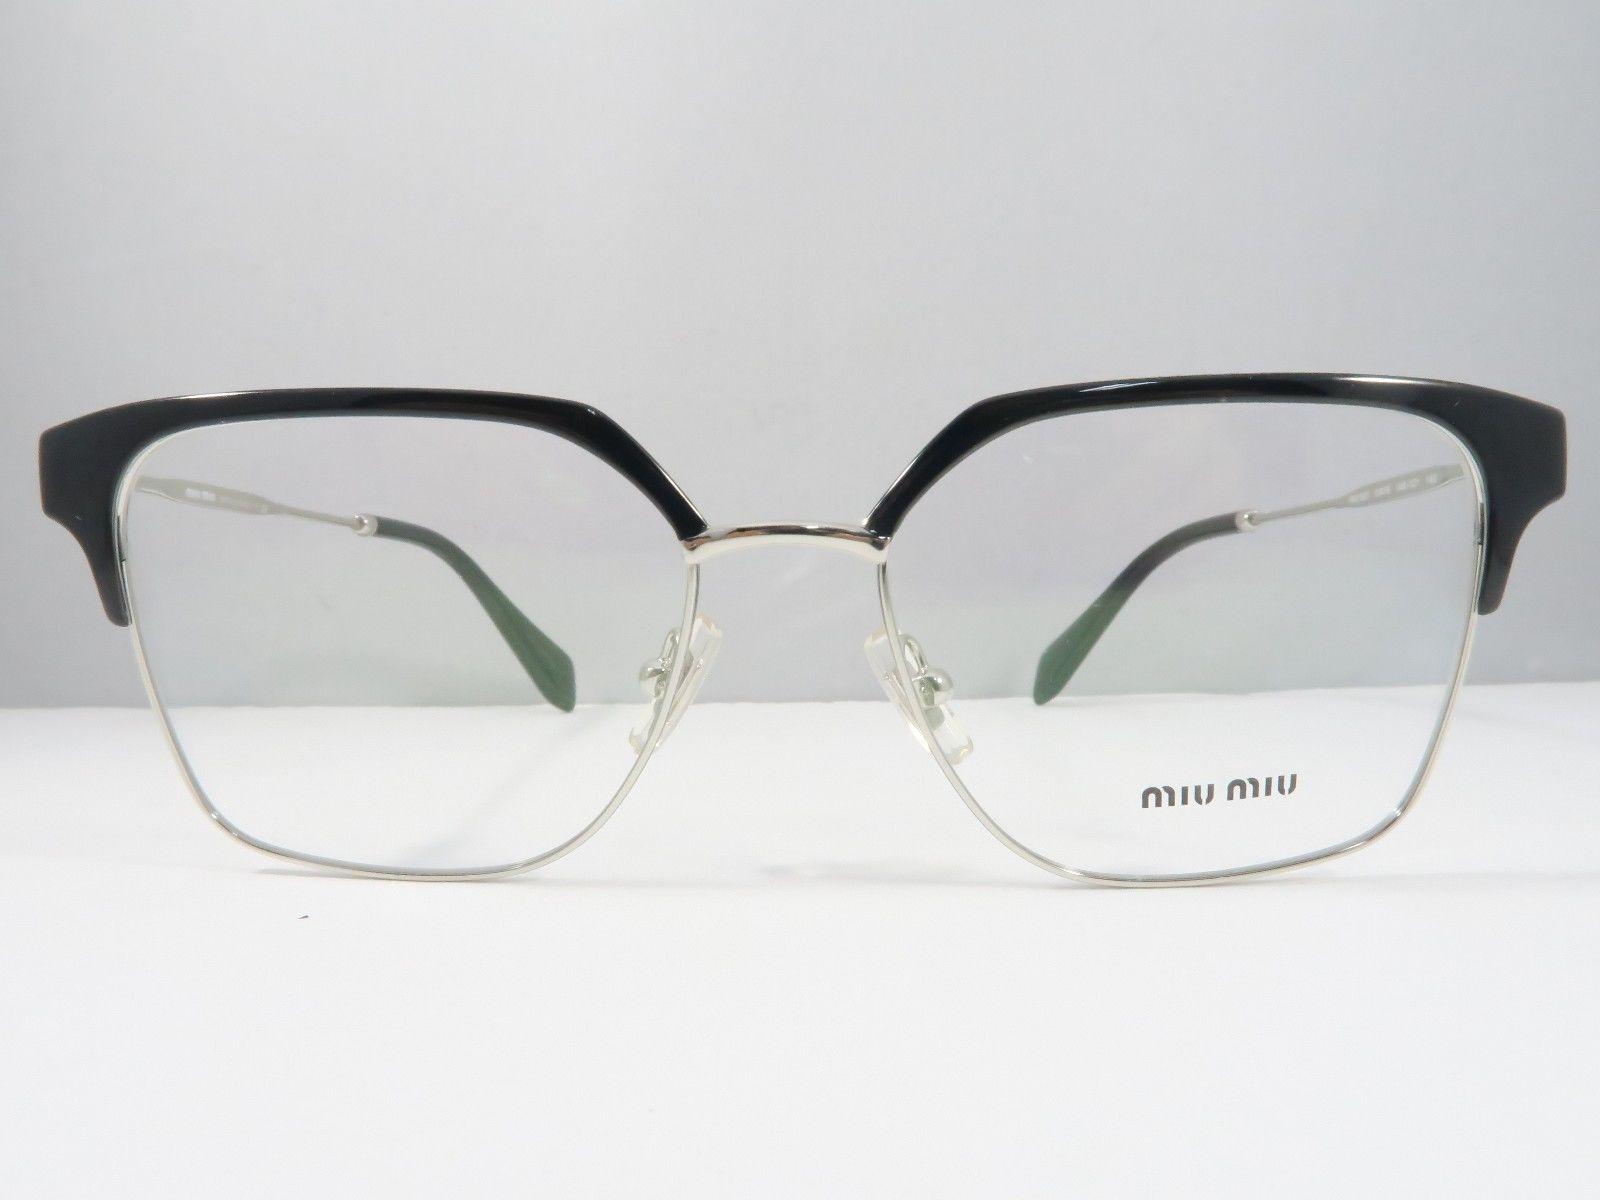 4ec03652d10b Miu Miu VMU 52O 1AB-1O1 Shiny Black   Silver and 27 similar items